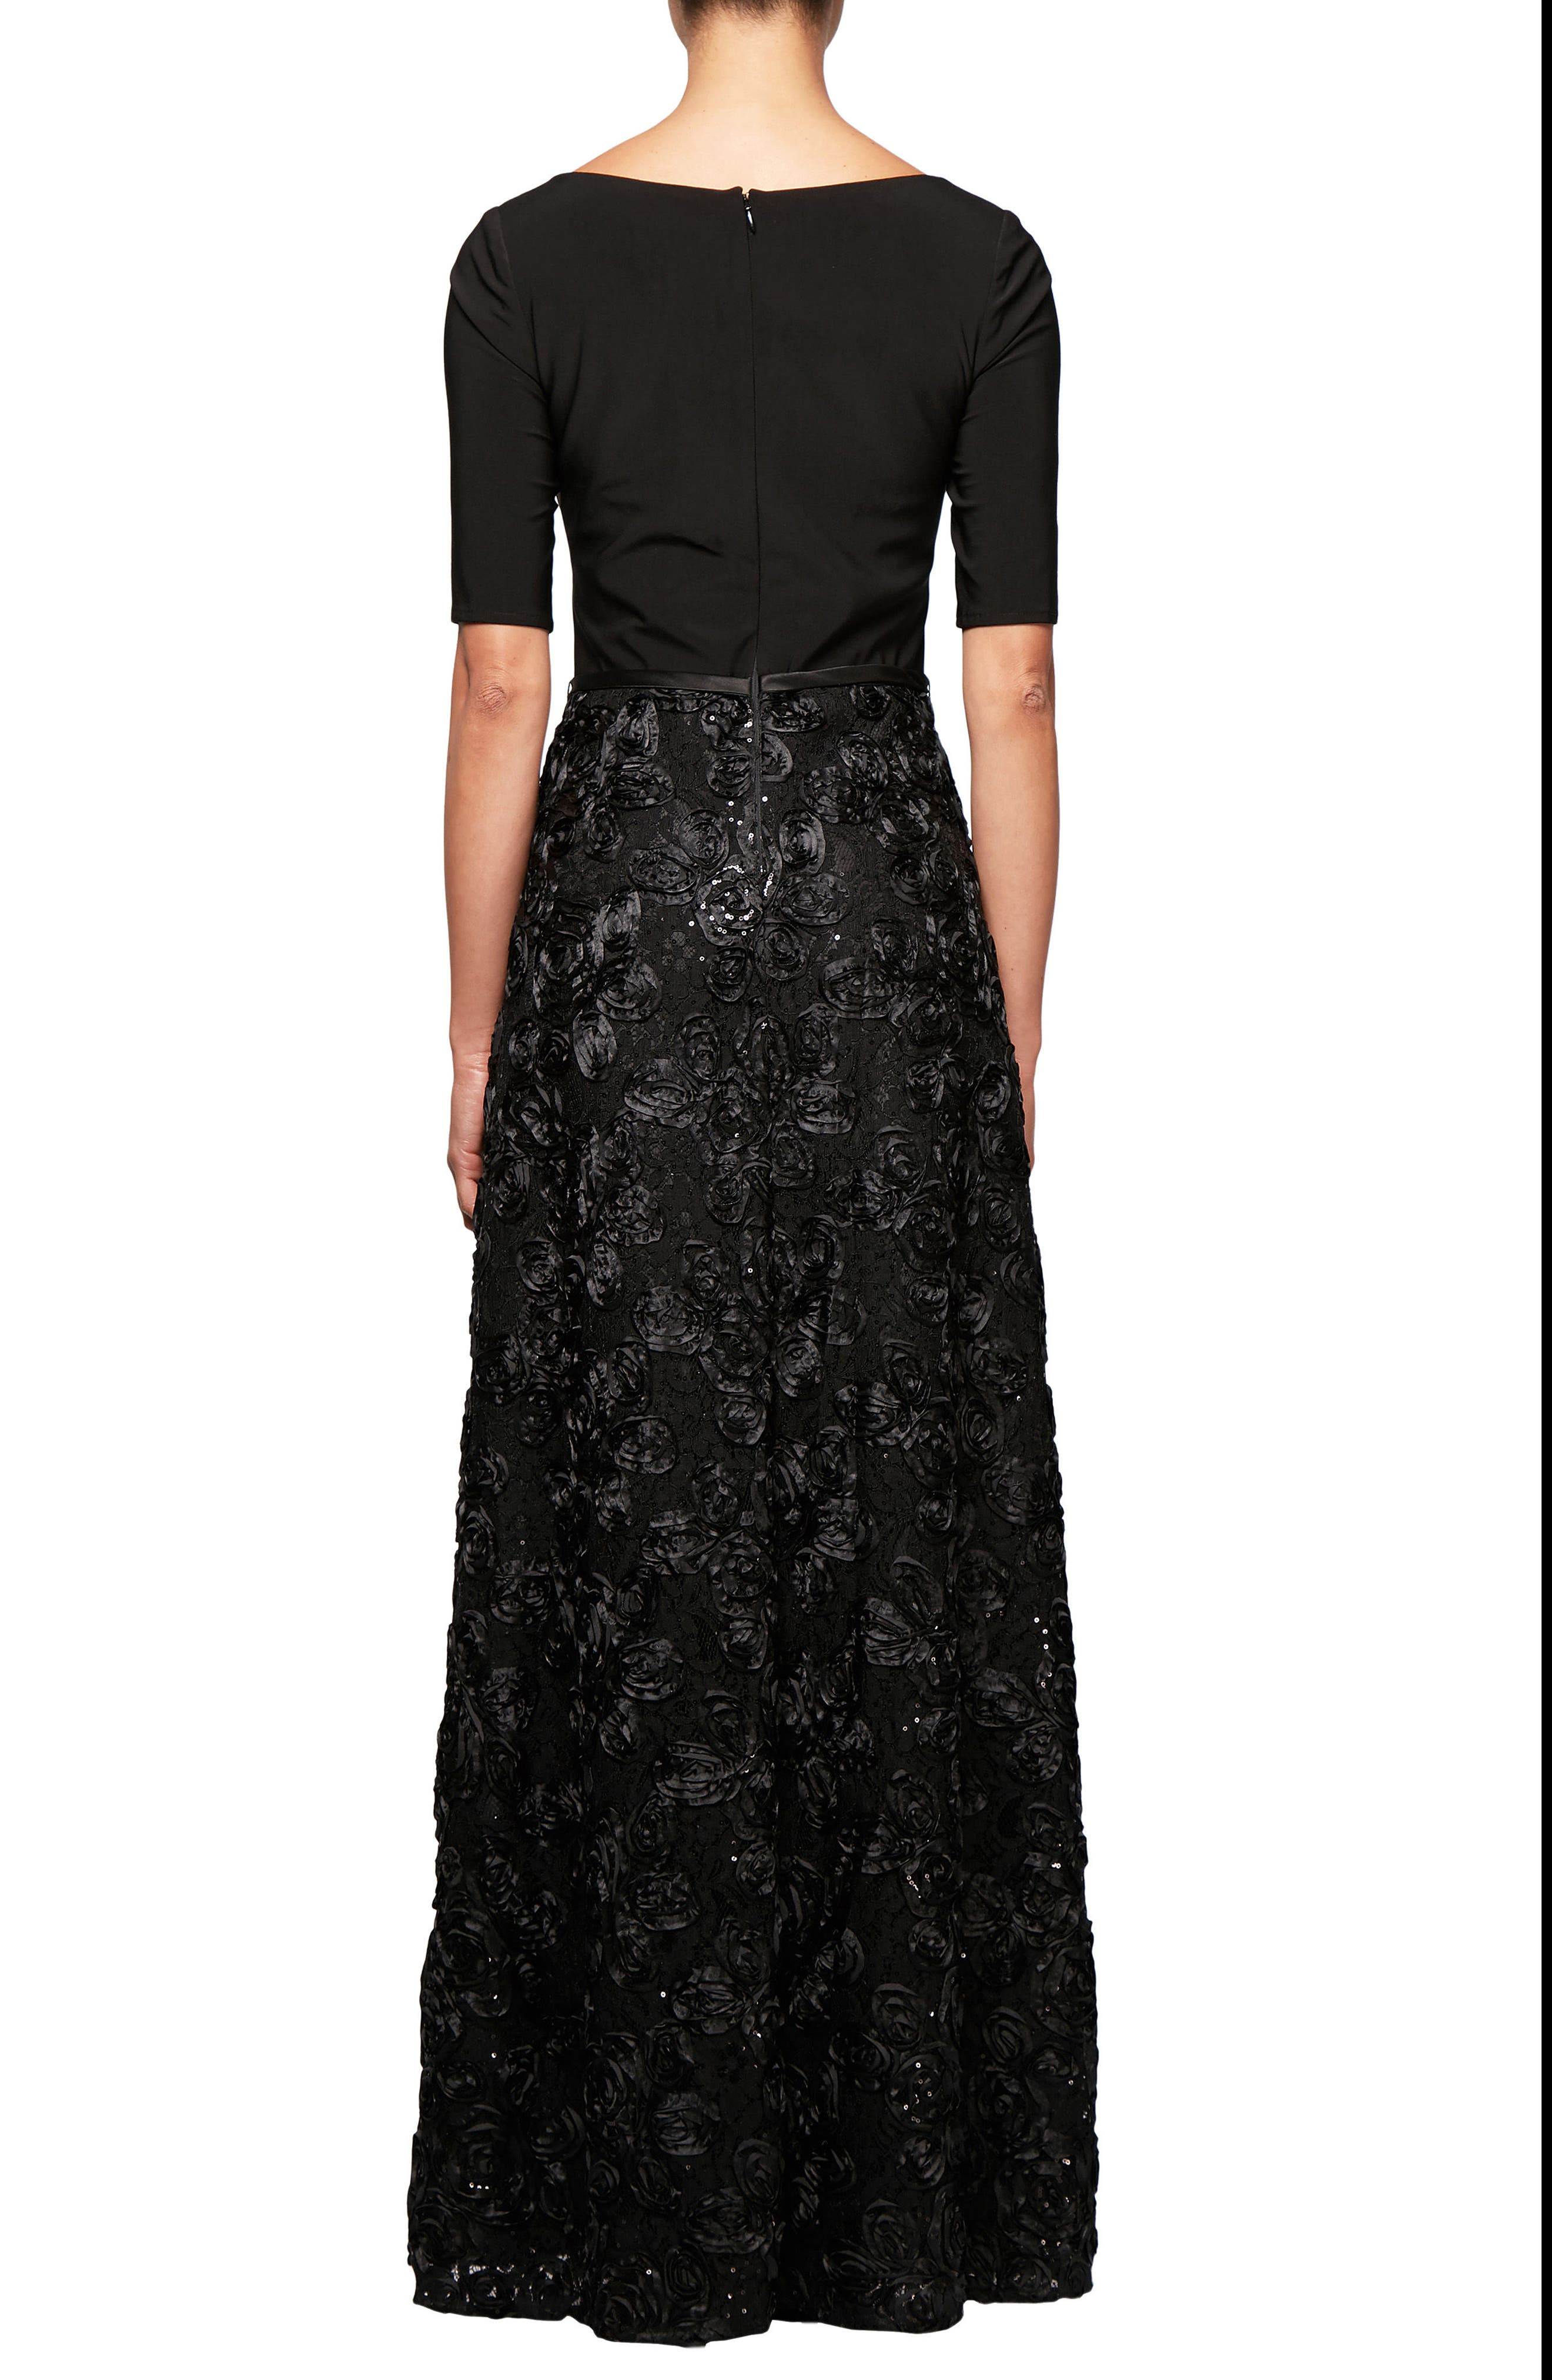 Embellished Rosette A-Line Gown,                             Alternate thumbnail 2, color,